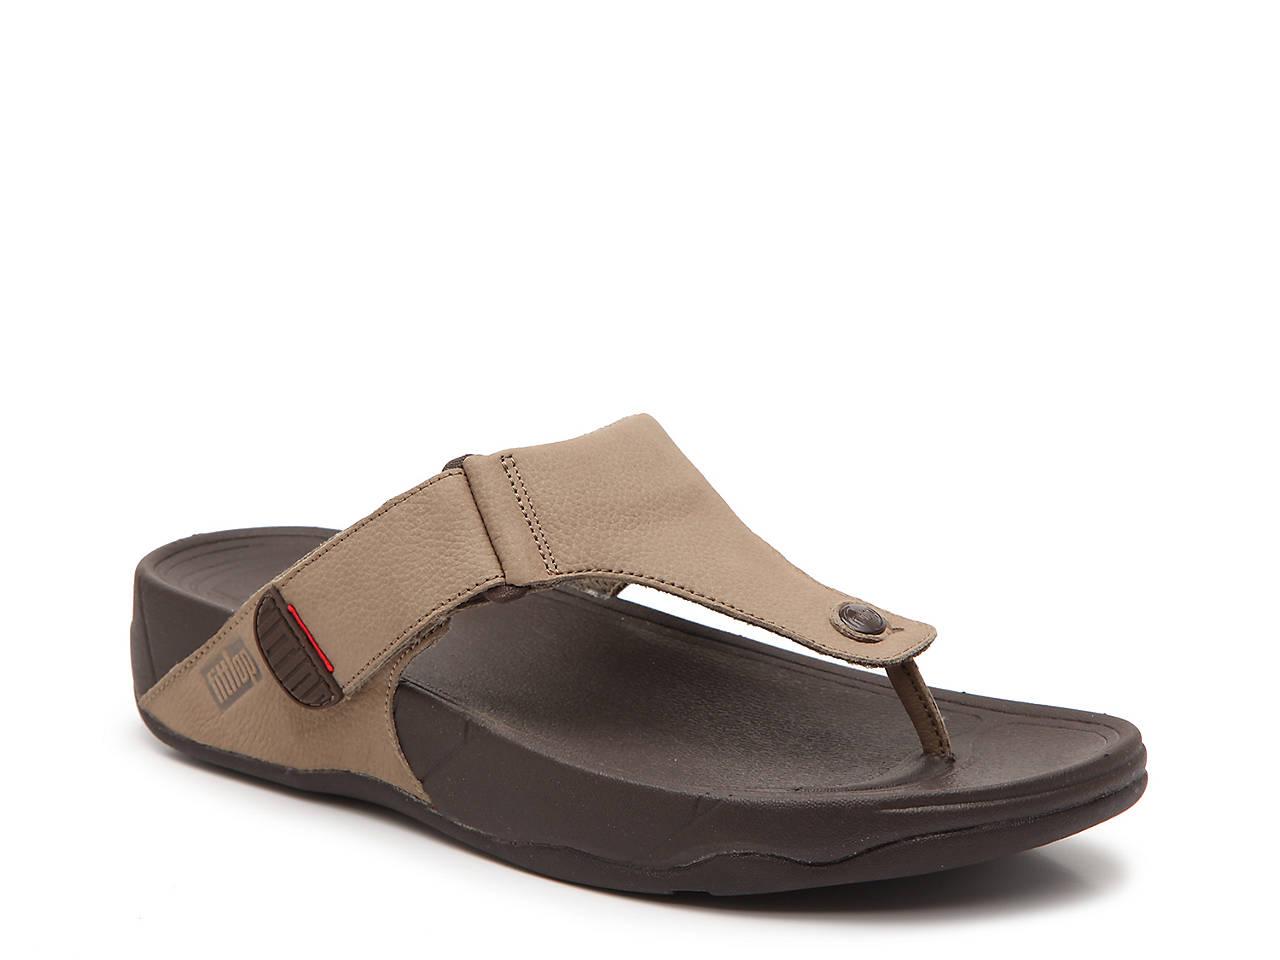 ce86c4c6cee78 FitFlop Trakk II Flip Flop Men s Shoes